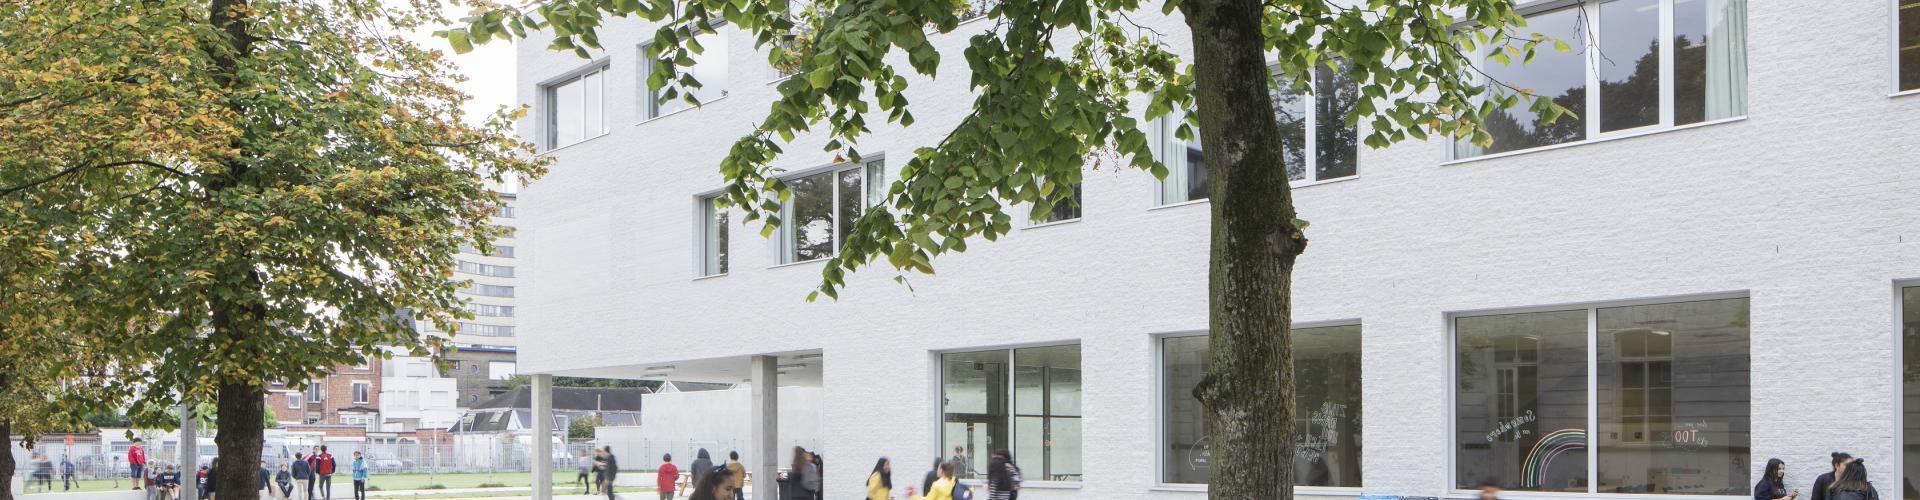 Freinetmiddenschool Gent